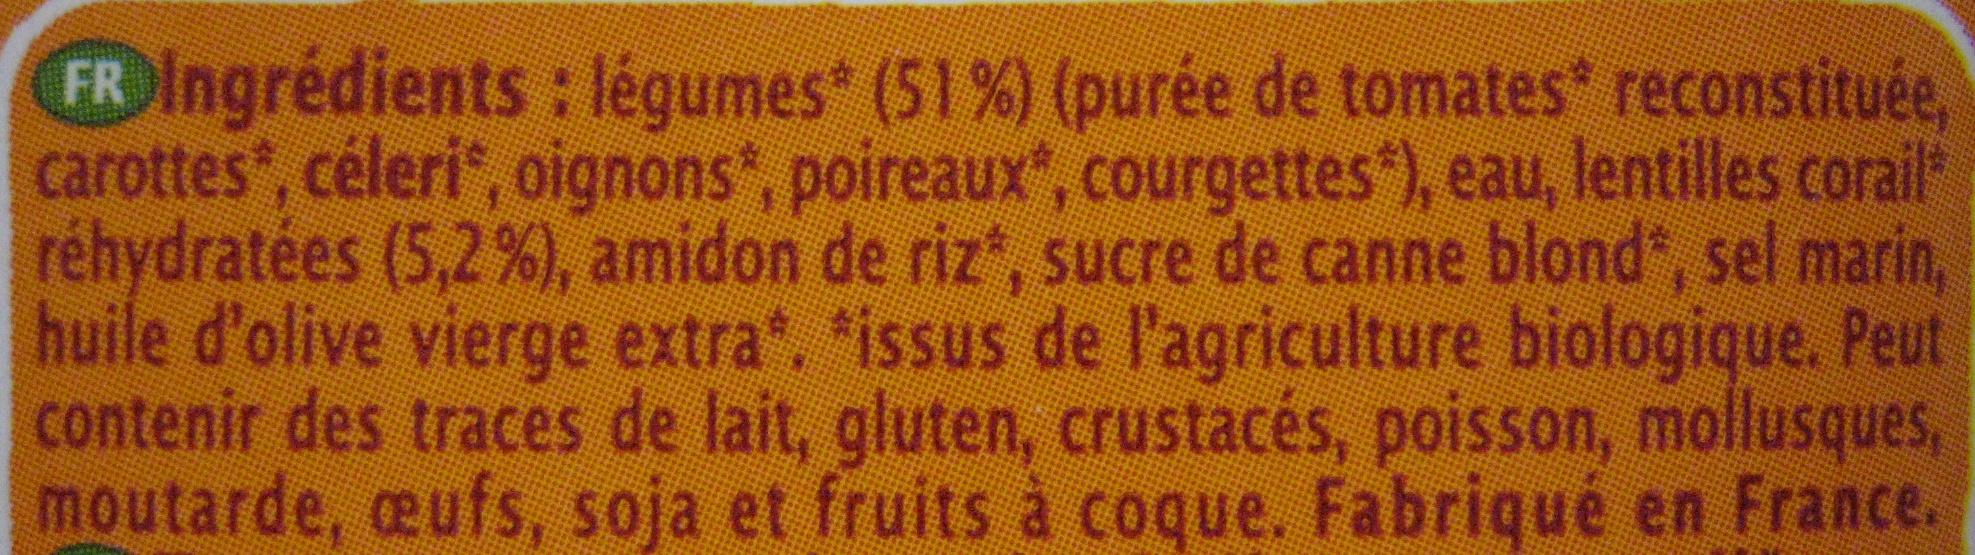 Velouté Tomates & Lentilles corail - Ingrediënten